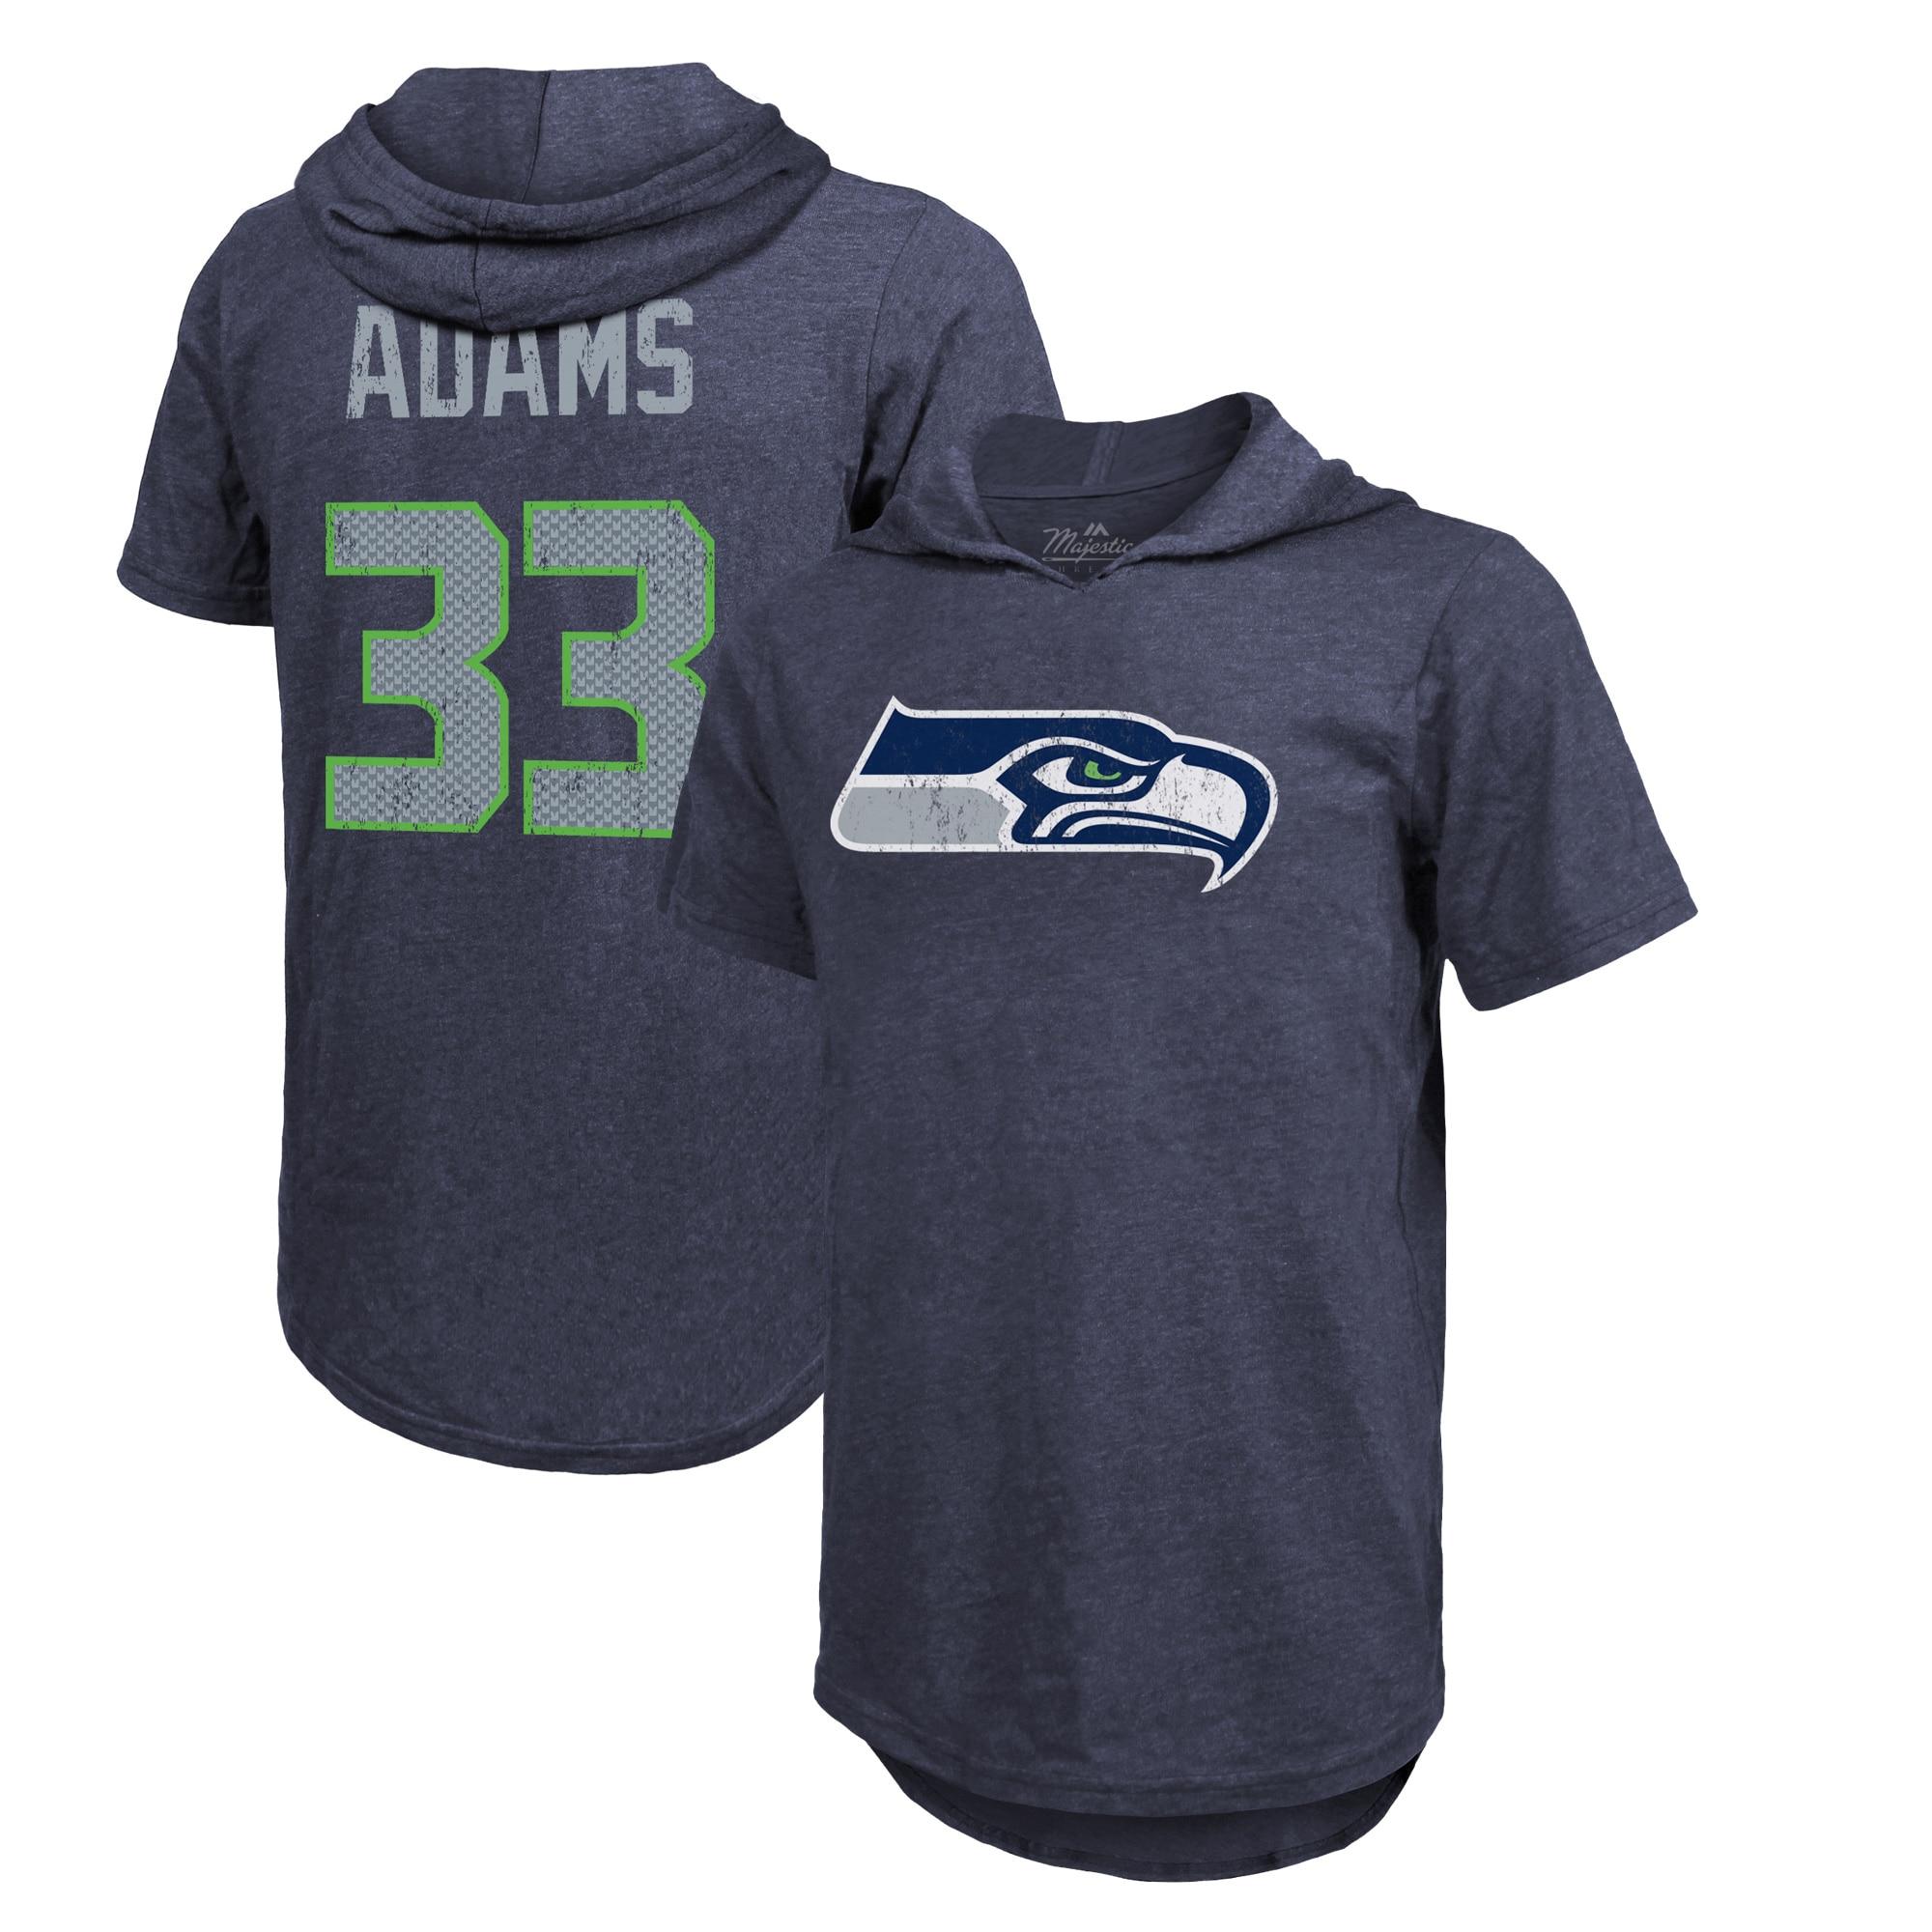 Jamal Adams Seattle Seahawks Fanatics Branded Player Name & Number Hoodie T-Shirt - College Navy